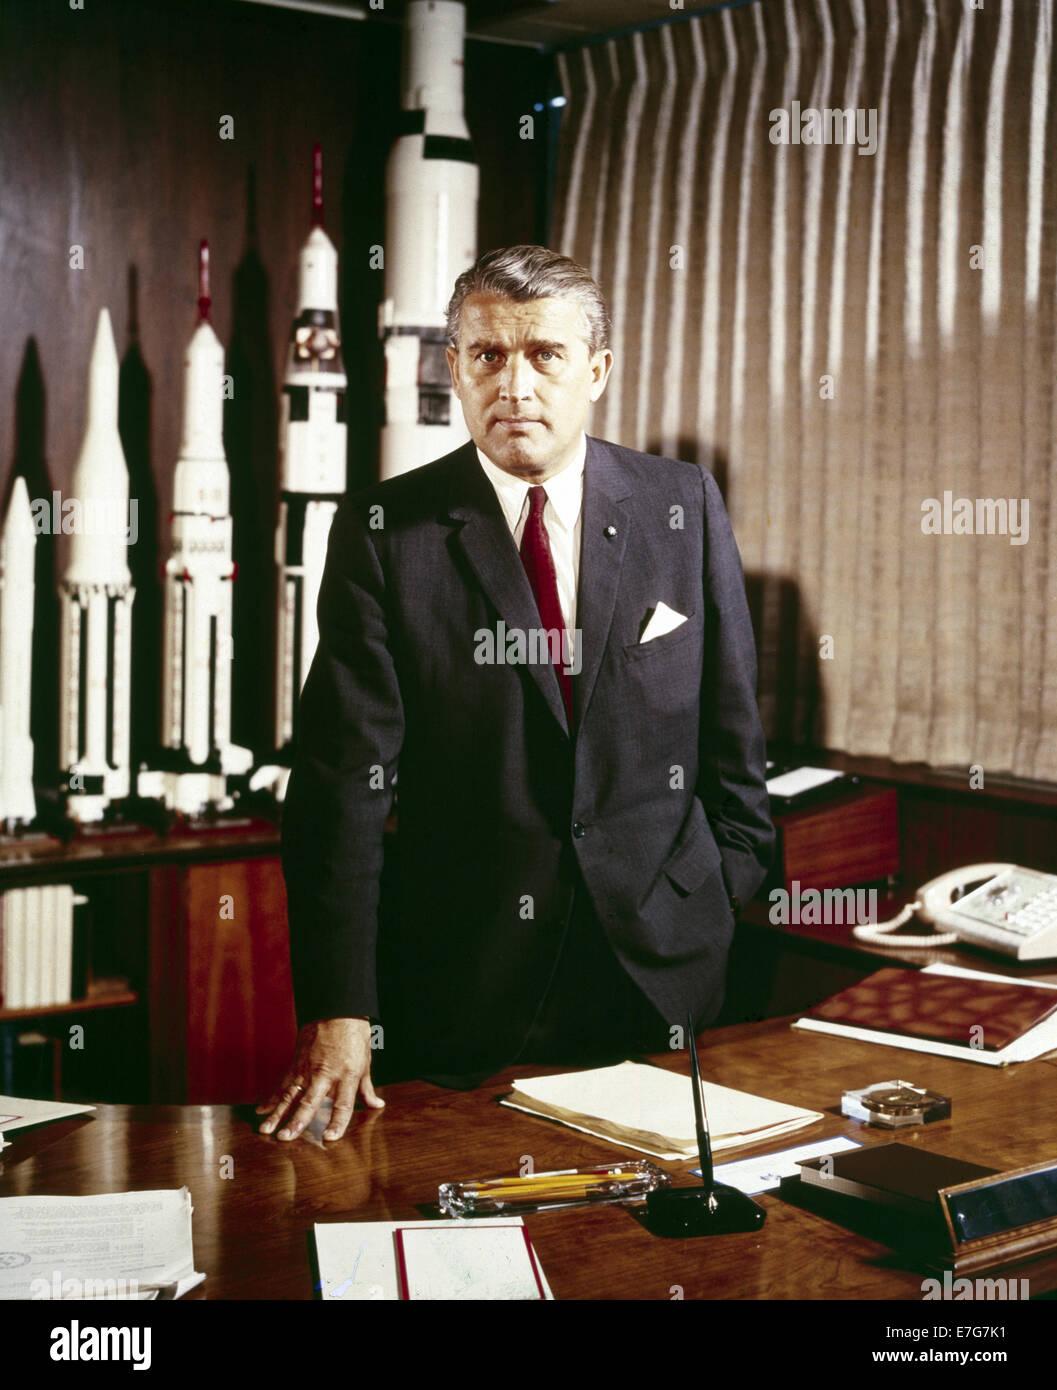 Wernher Magnus Maximilian, Freiherr von Braun. German and American aerospace engineer and space architect. - Stock Image